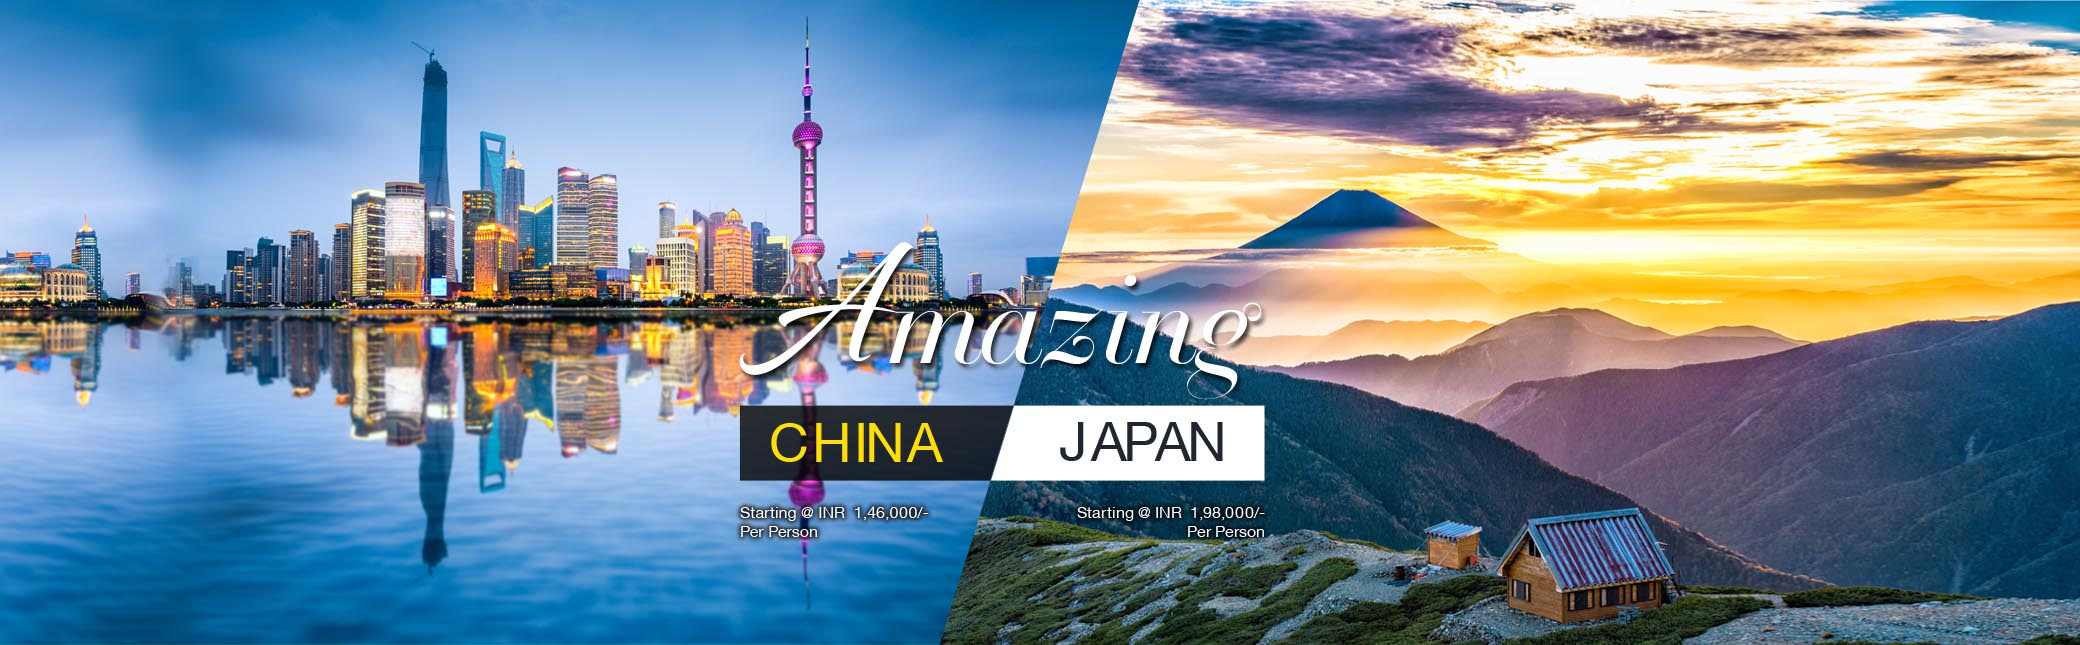 China & Japan Tours